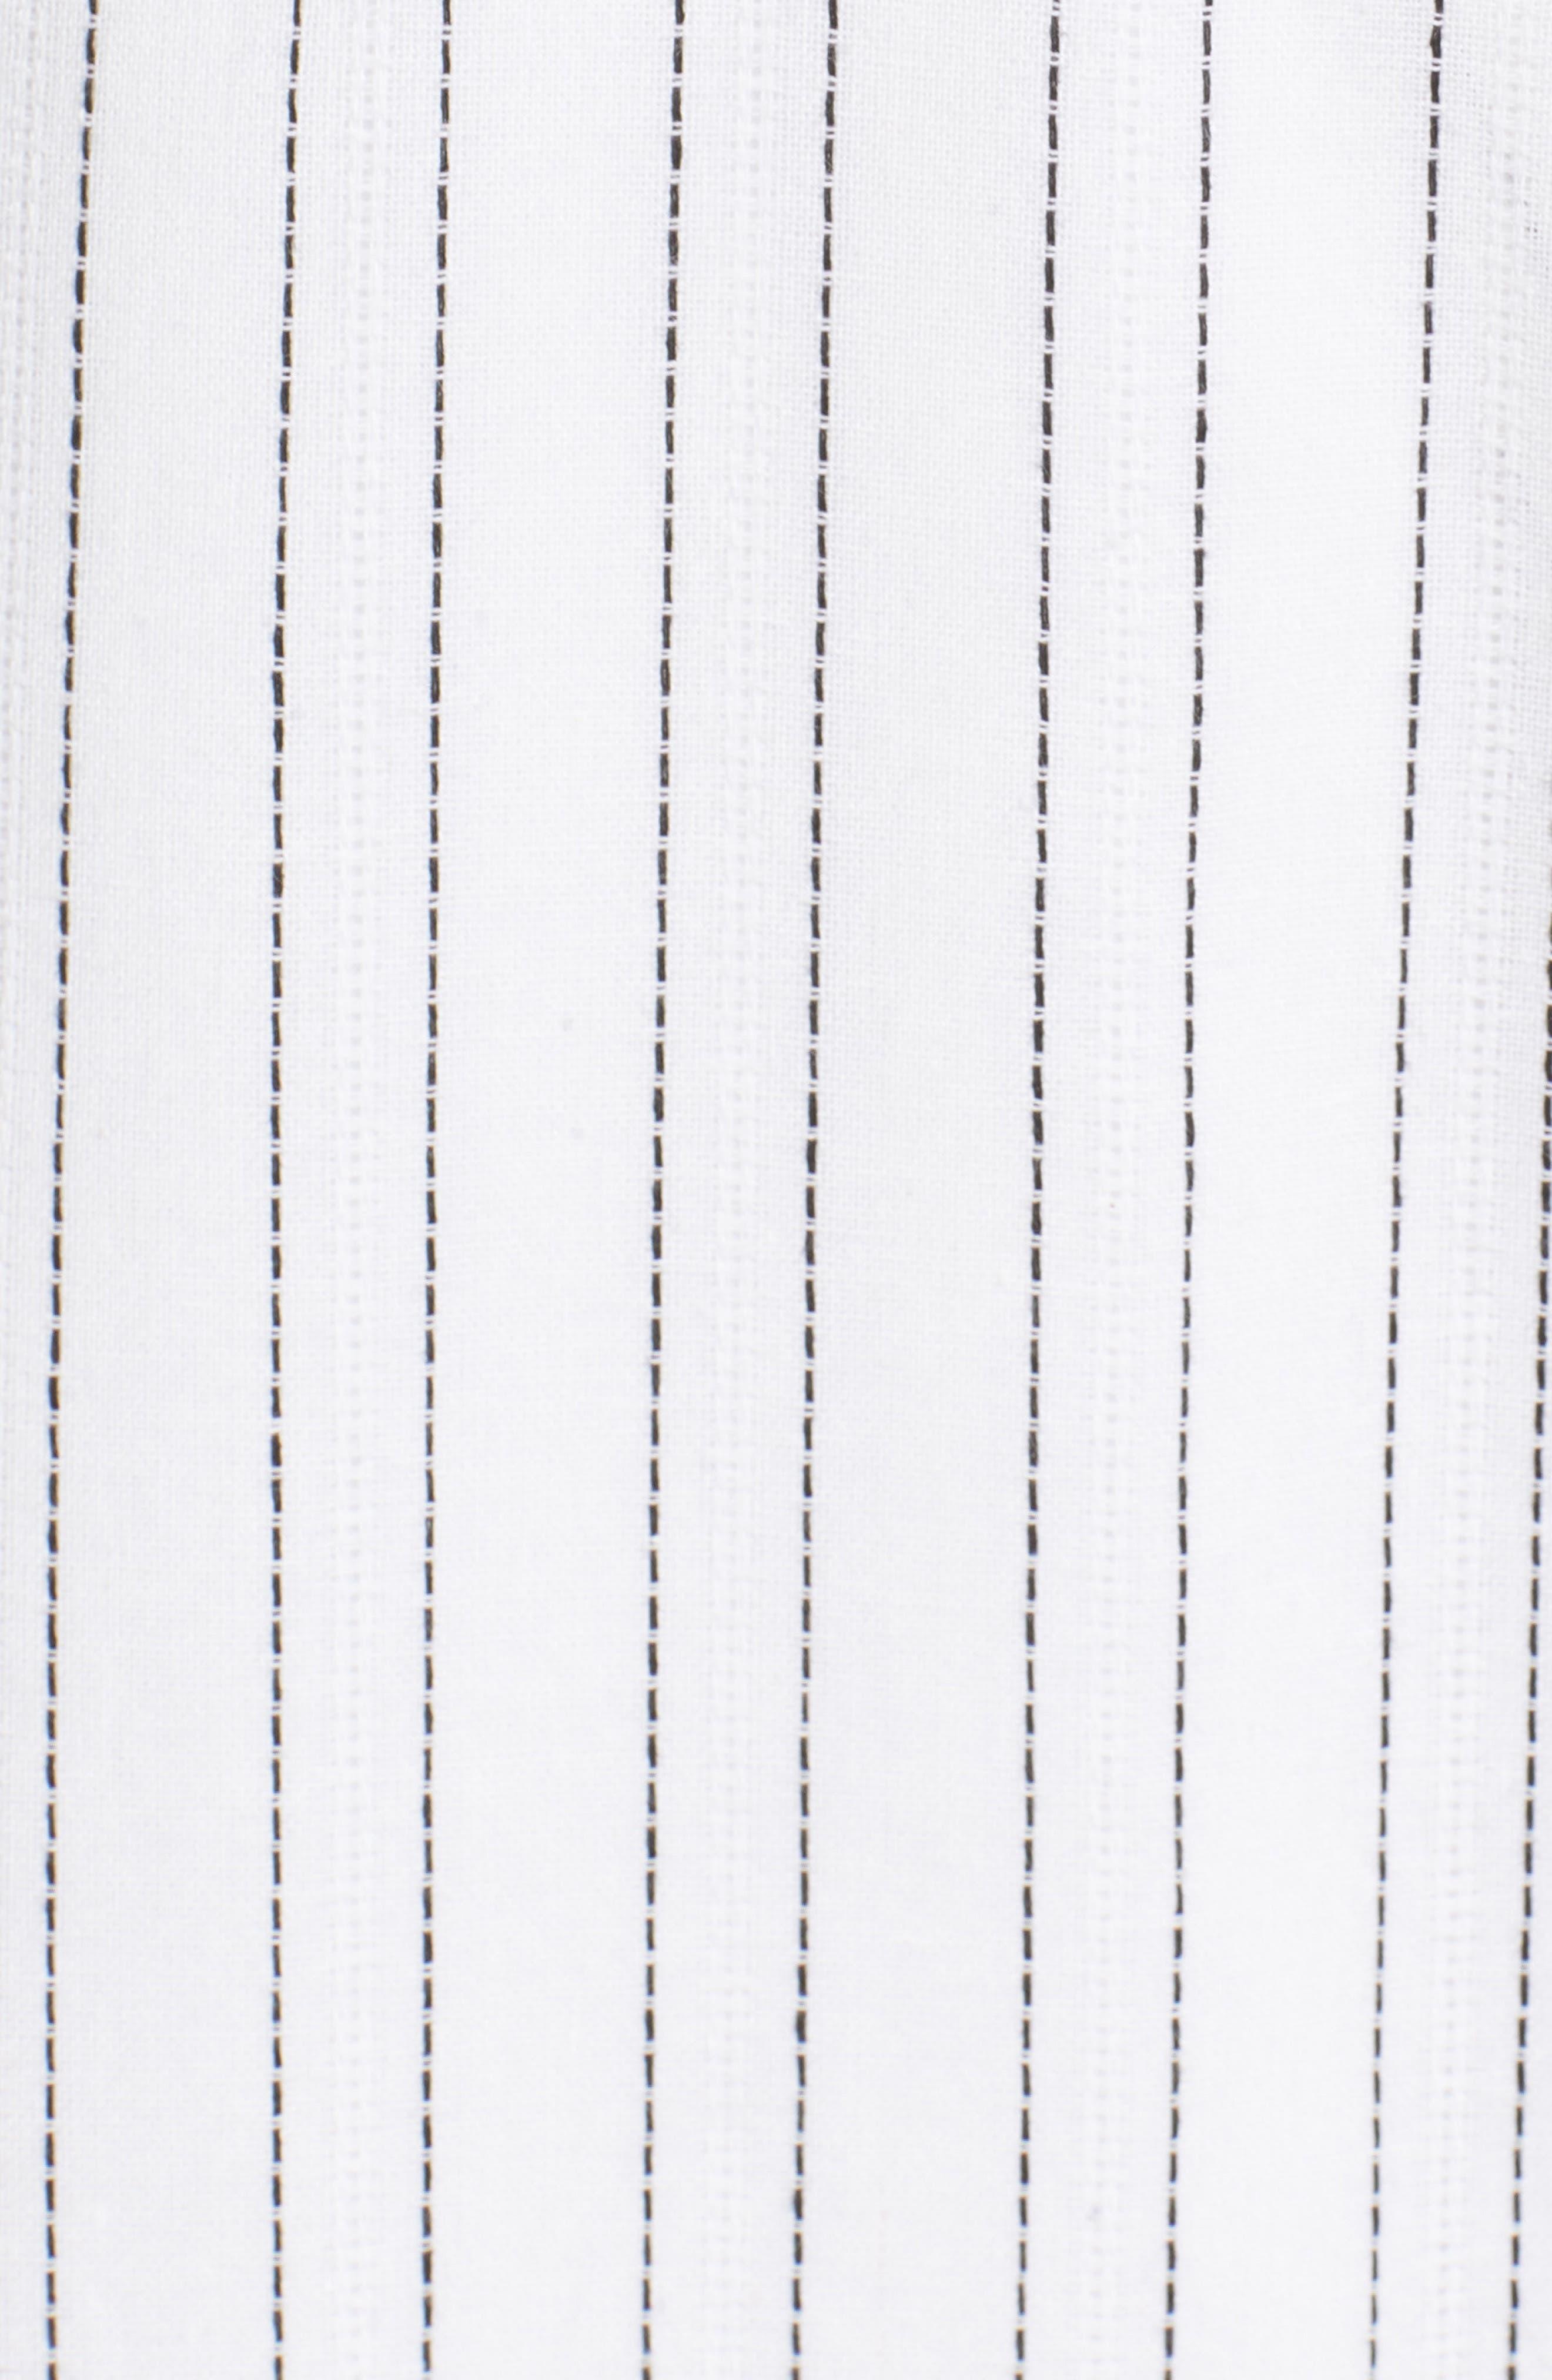 Cold Shoulder Midi Dress,                             Alternate thumbnail 6, color,                             White/ Black